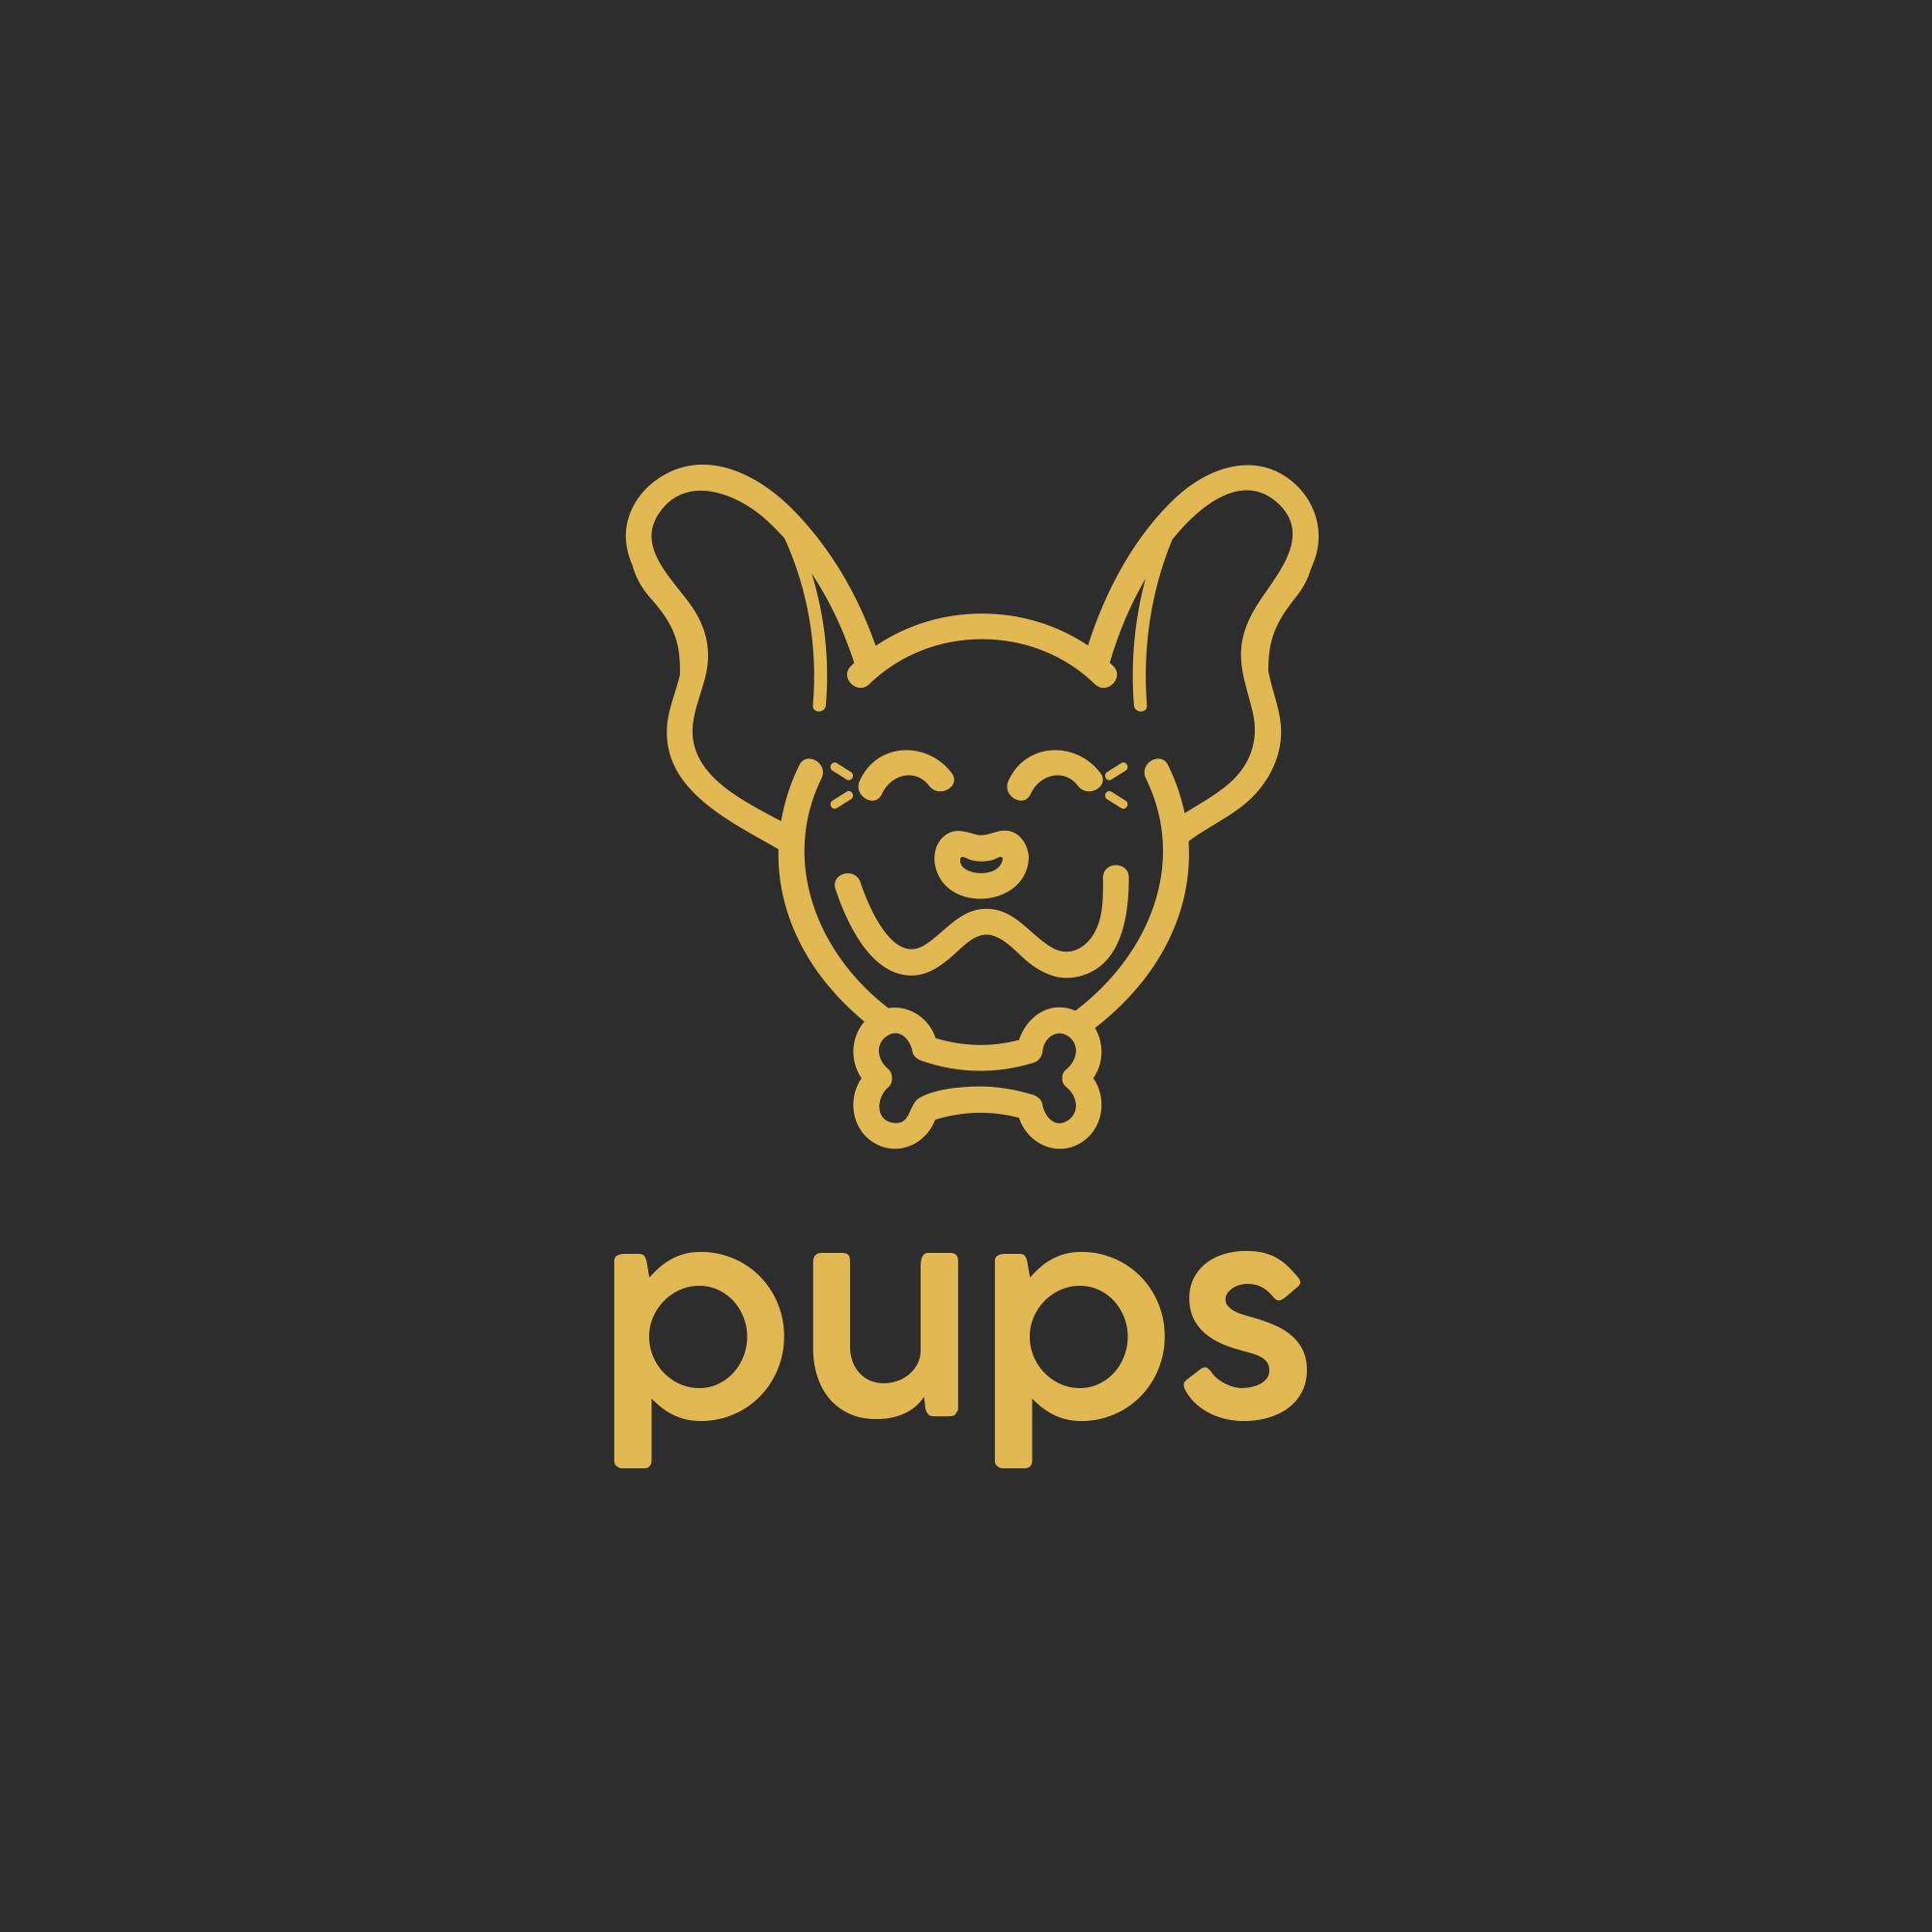 015 pups yellow